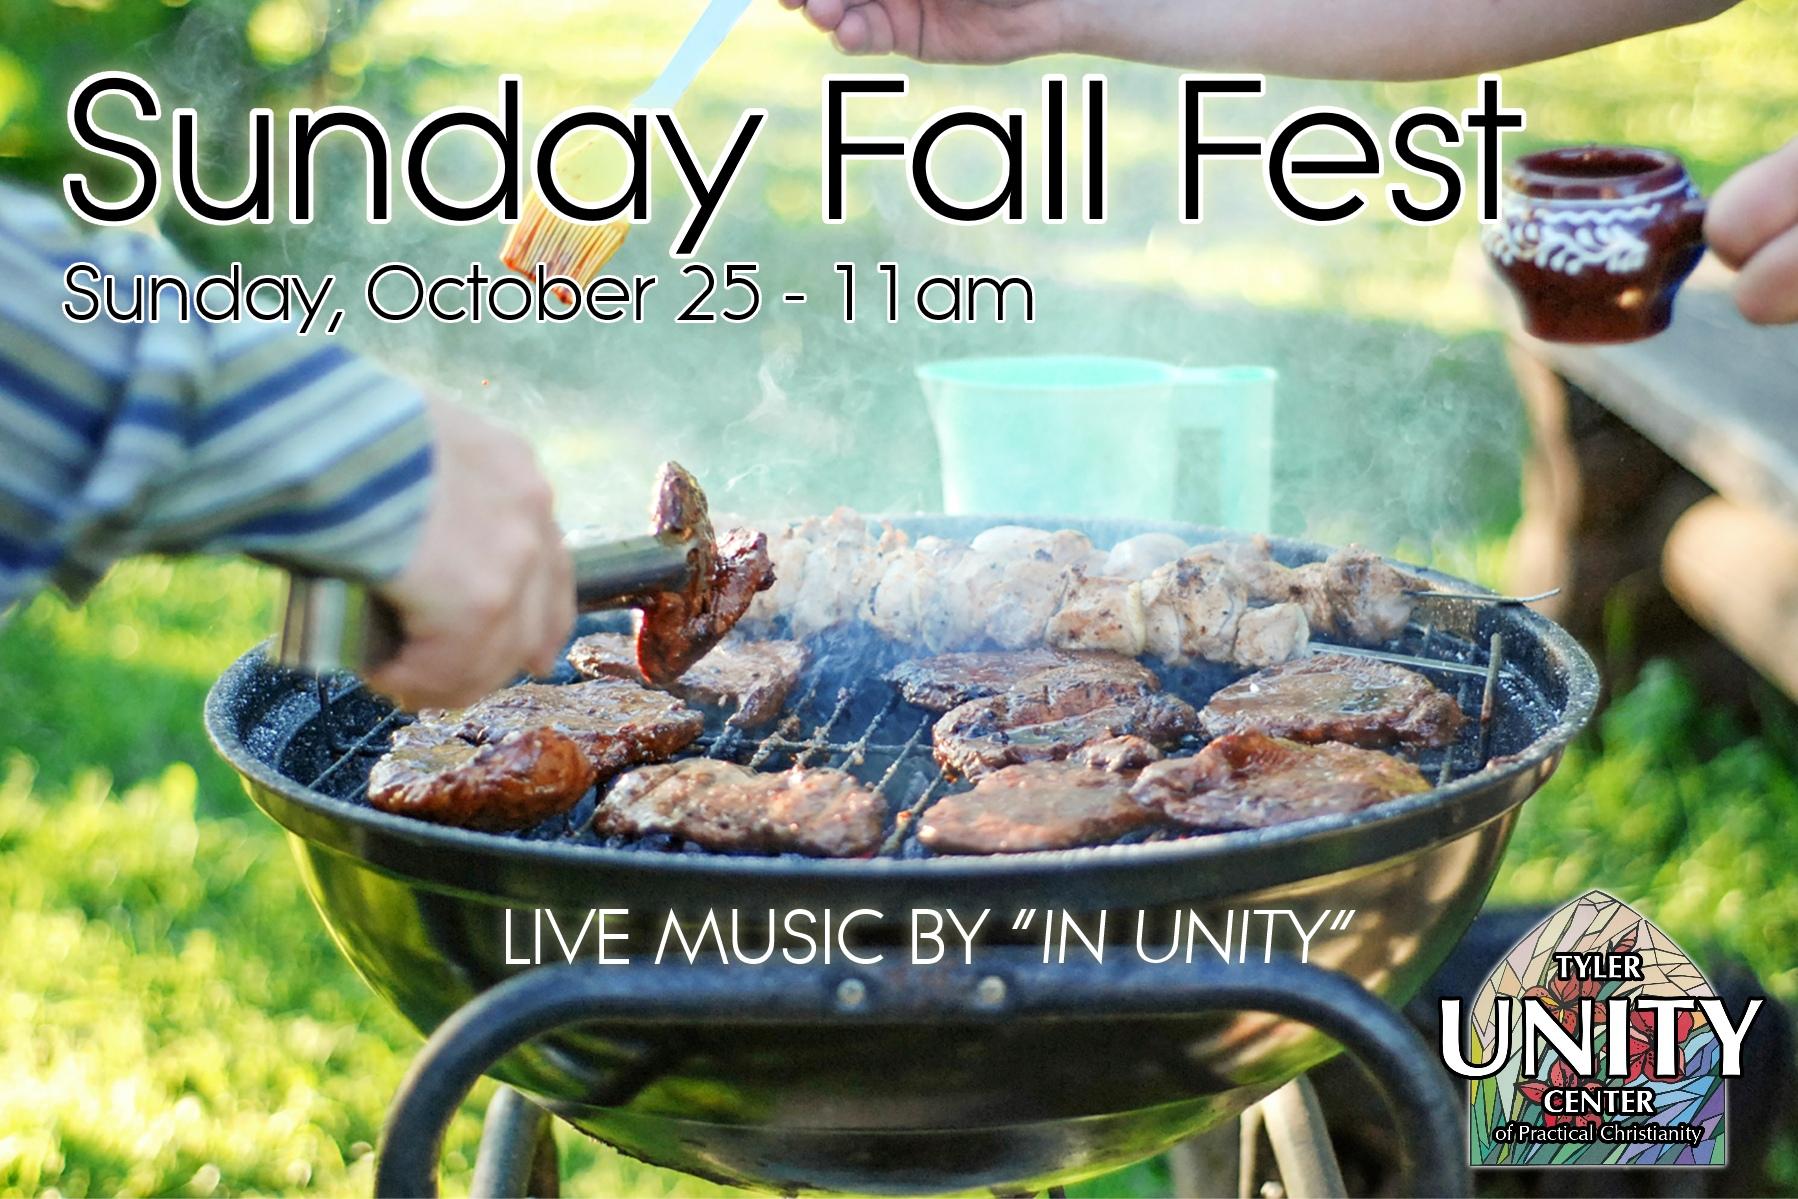 Sunday Fall Fest